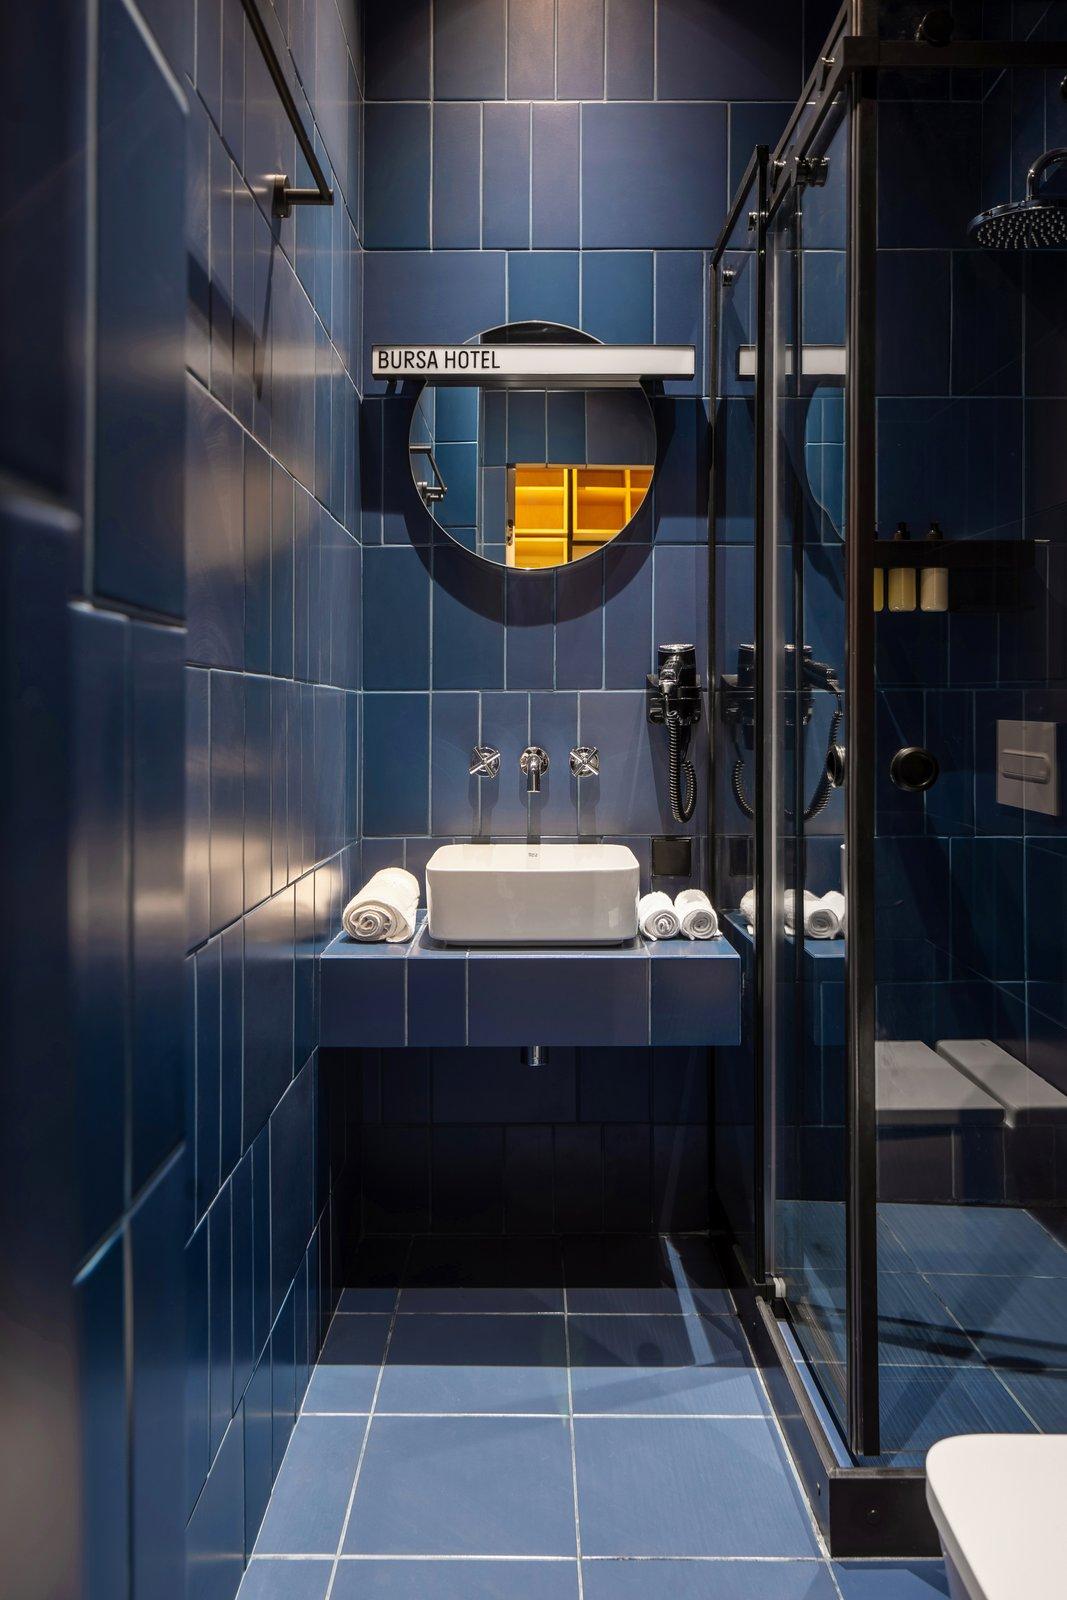 Bursa Hotel bathroom with blue tile